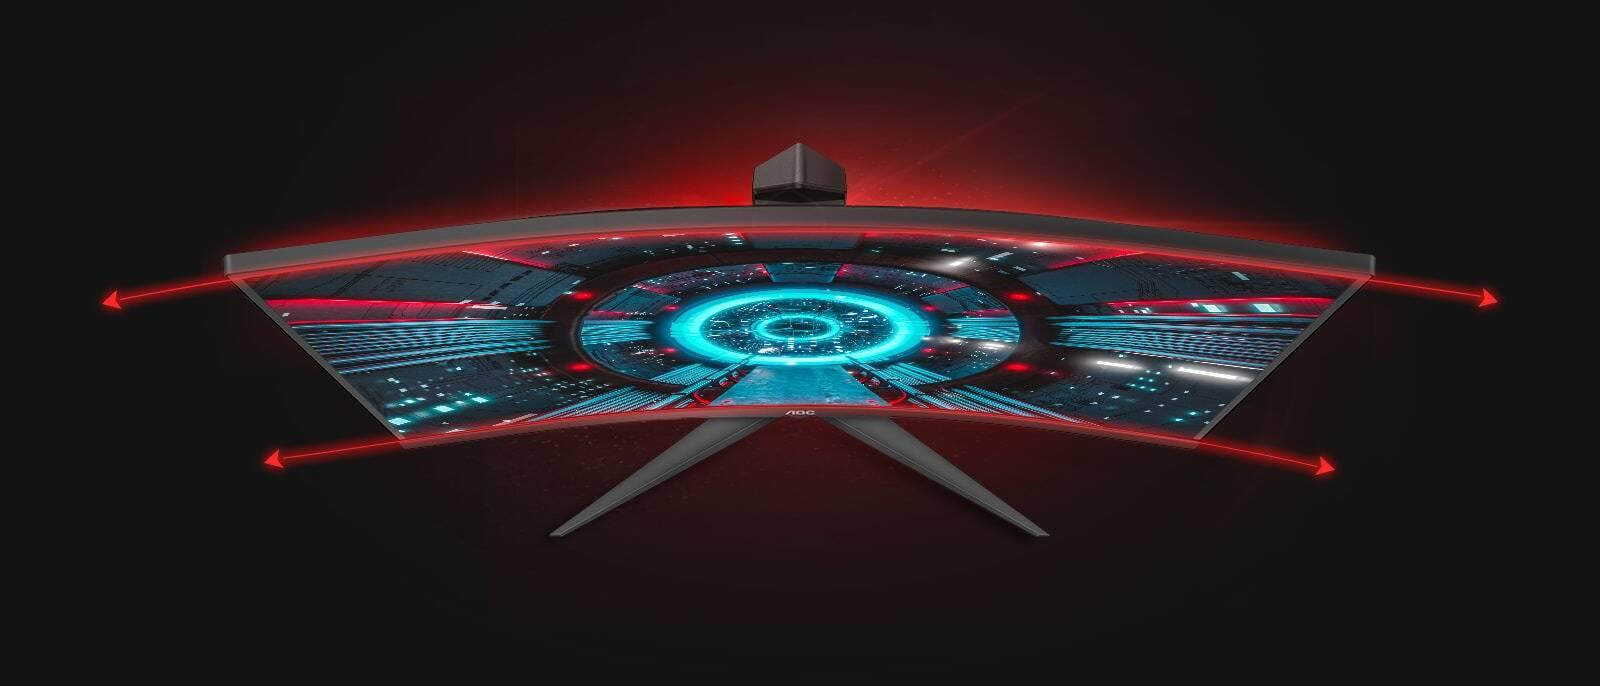 AOC G2 series monitor